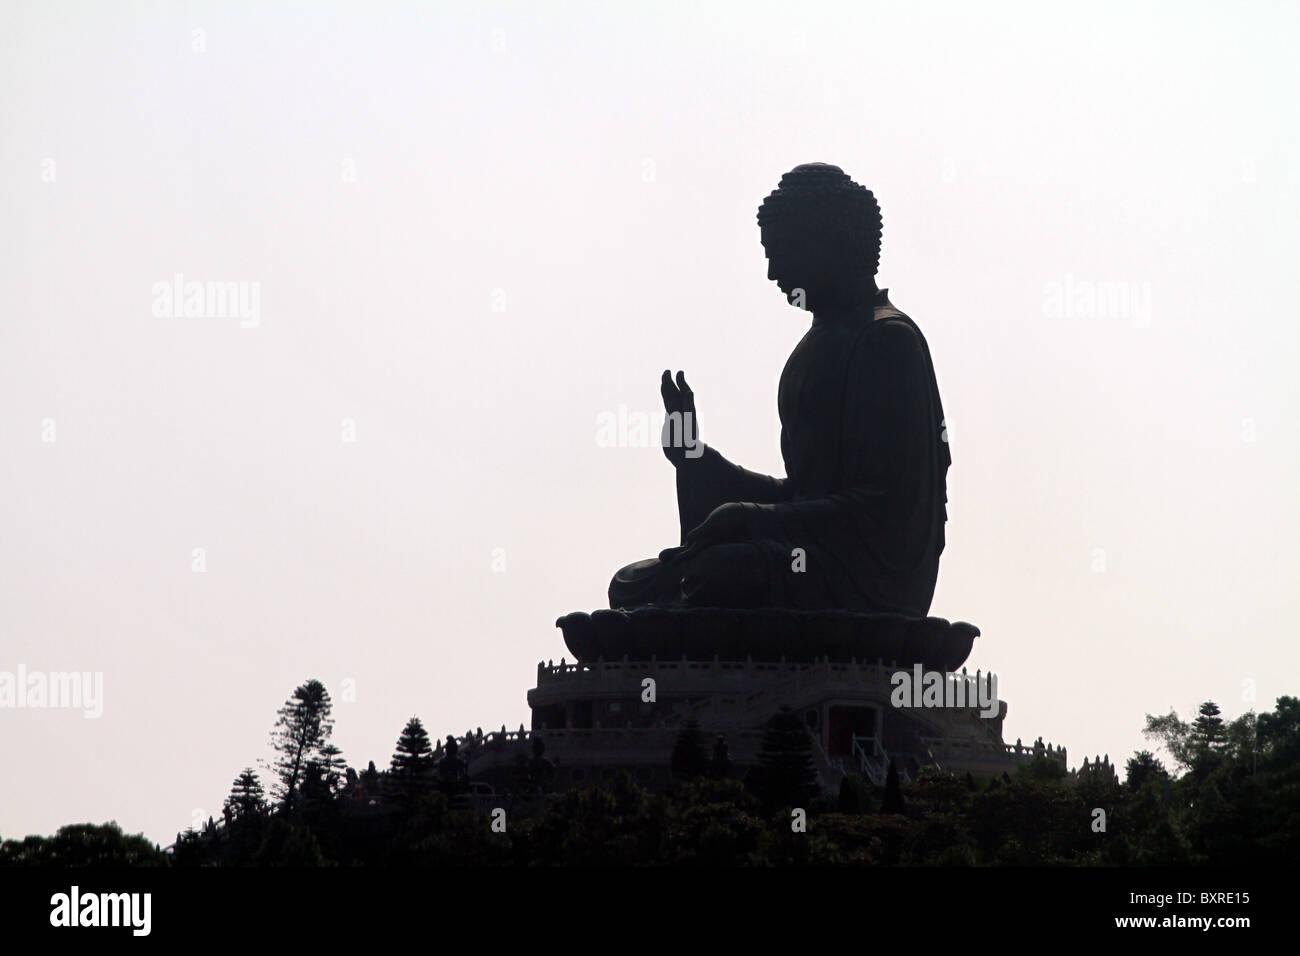 Silhouette of the Tian Tan Buddha statue on Lantau Island in Hong Kong, China - Stock Image